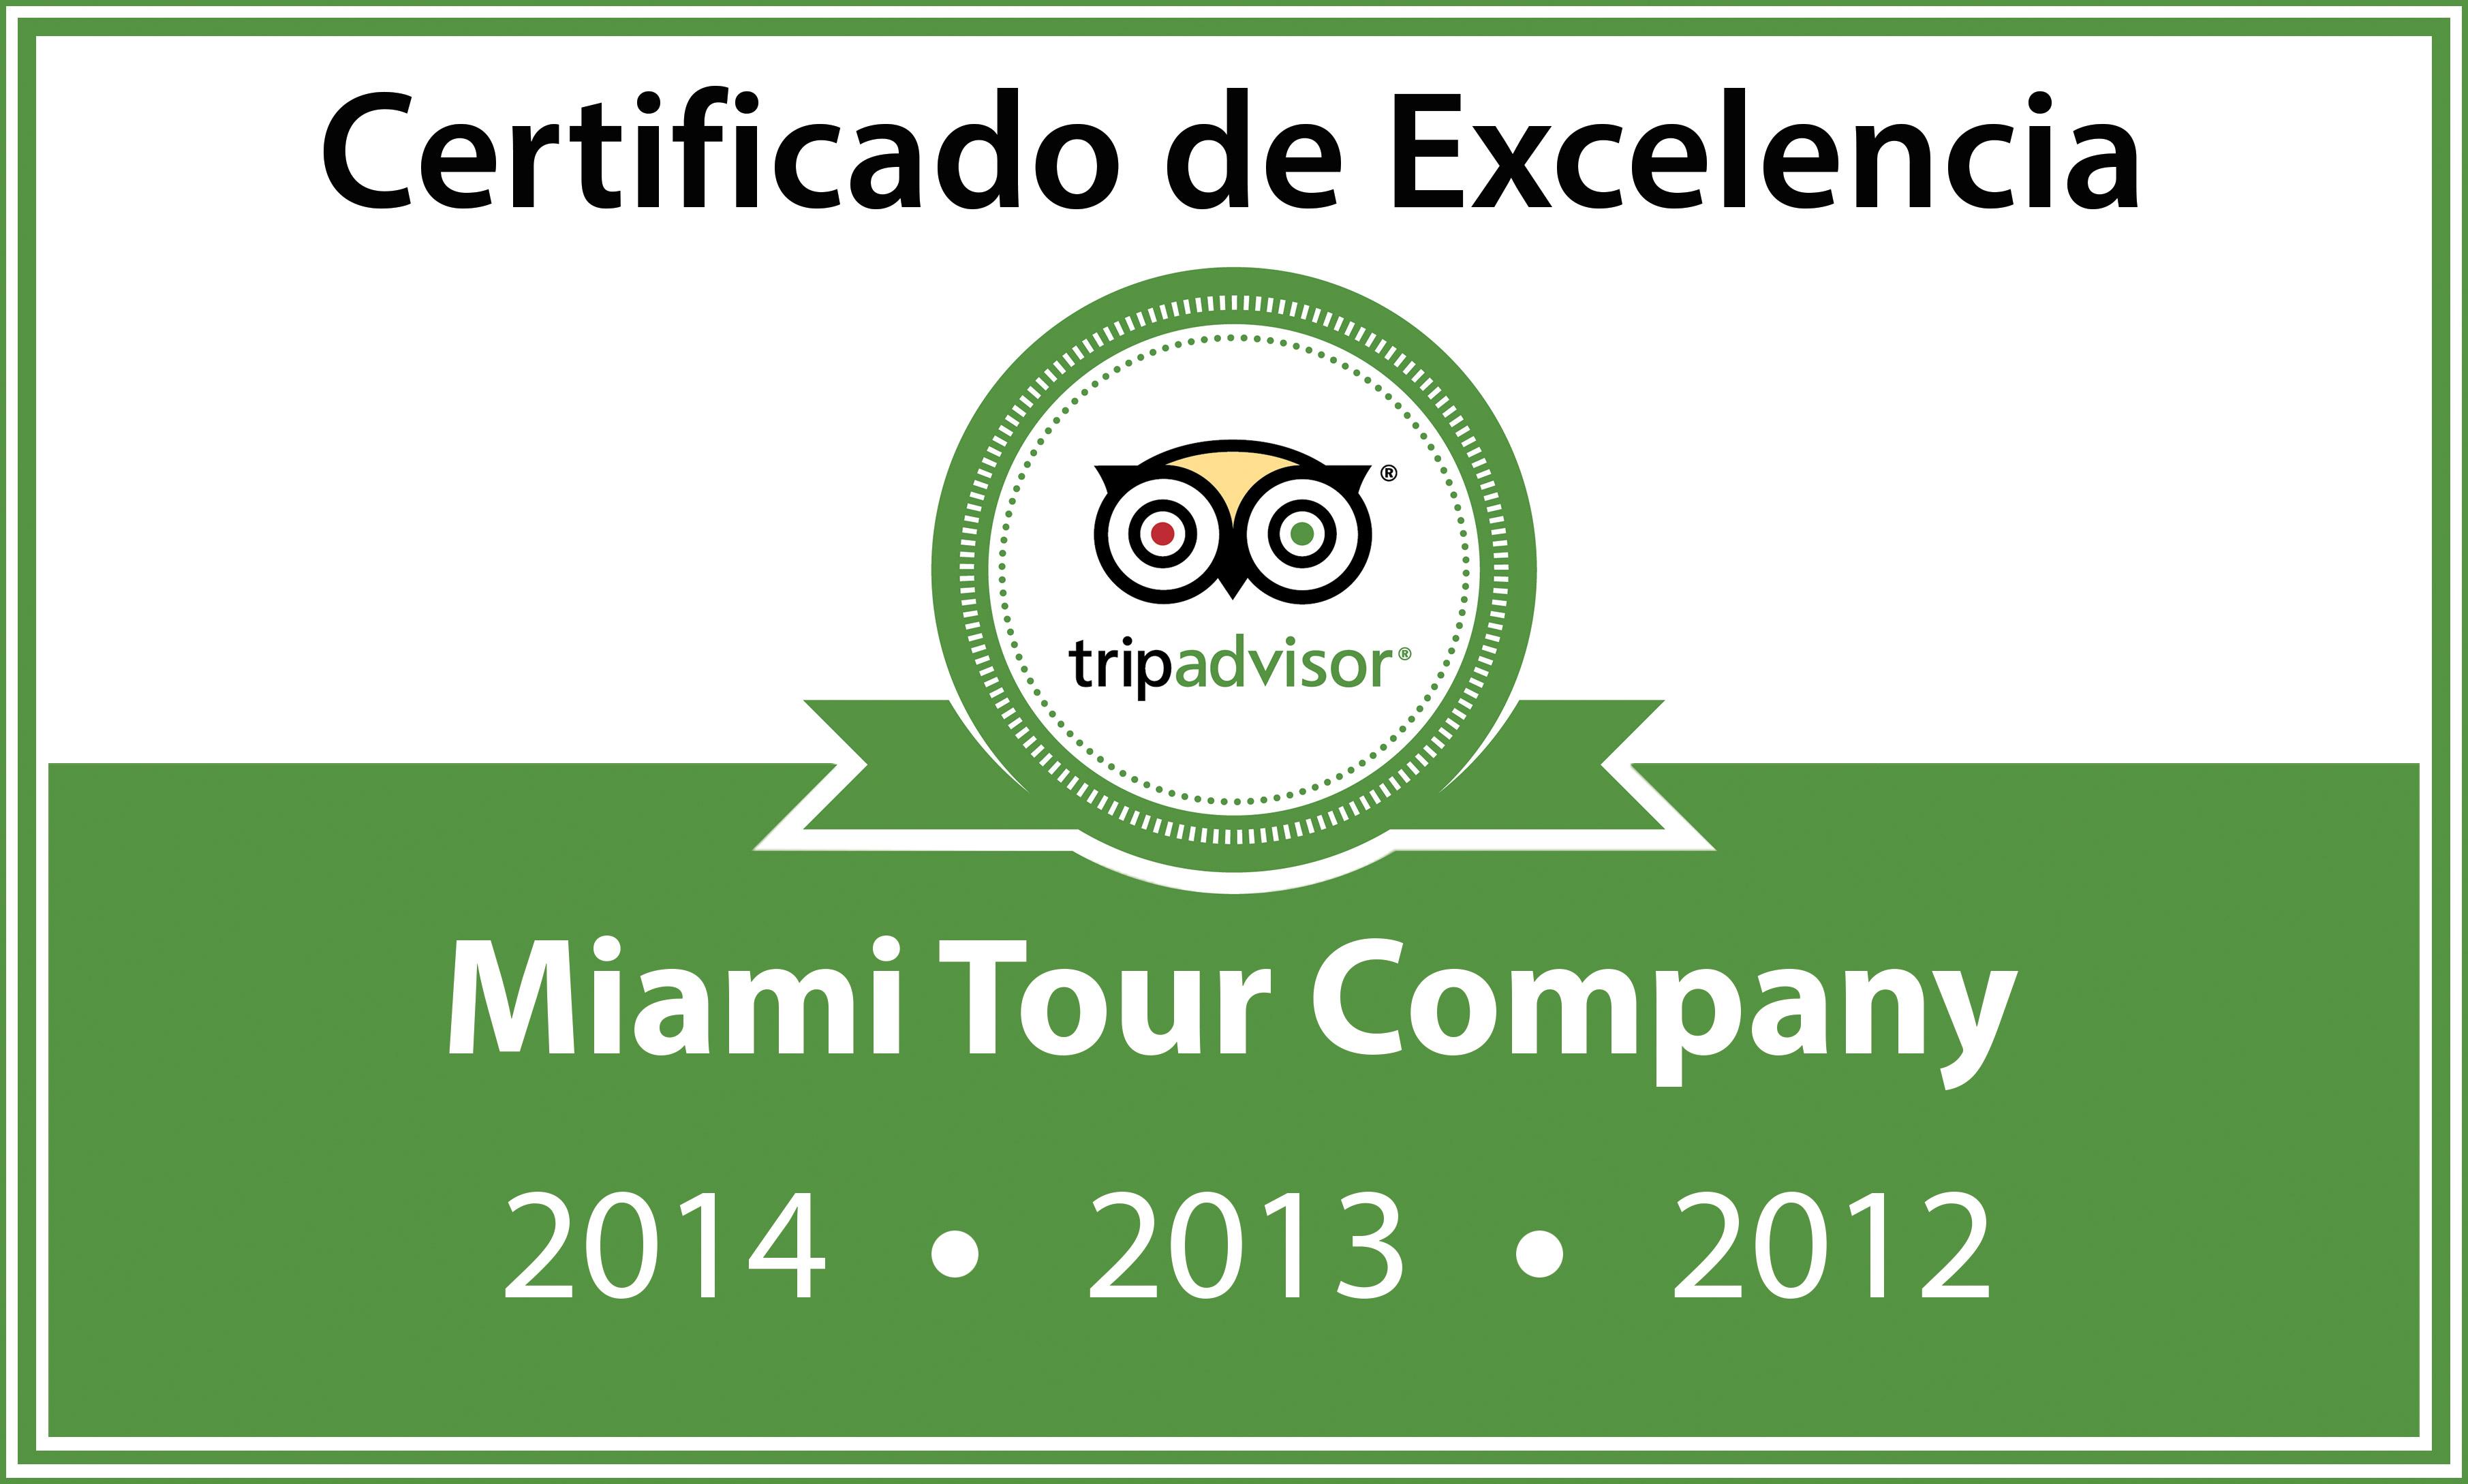 TripAdvisor Certificado de Excellencia por satisfacción a clientes